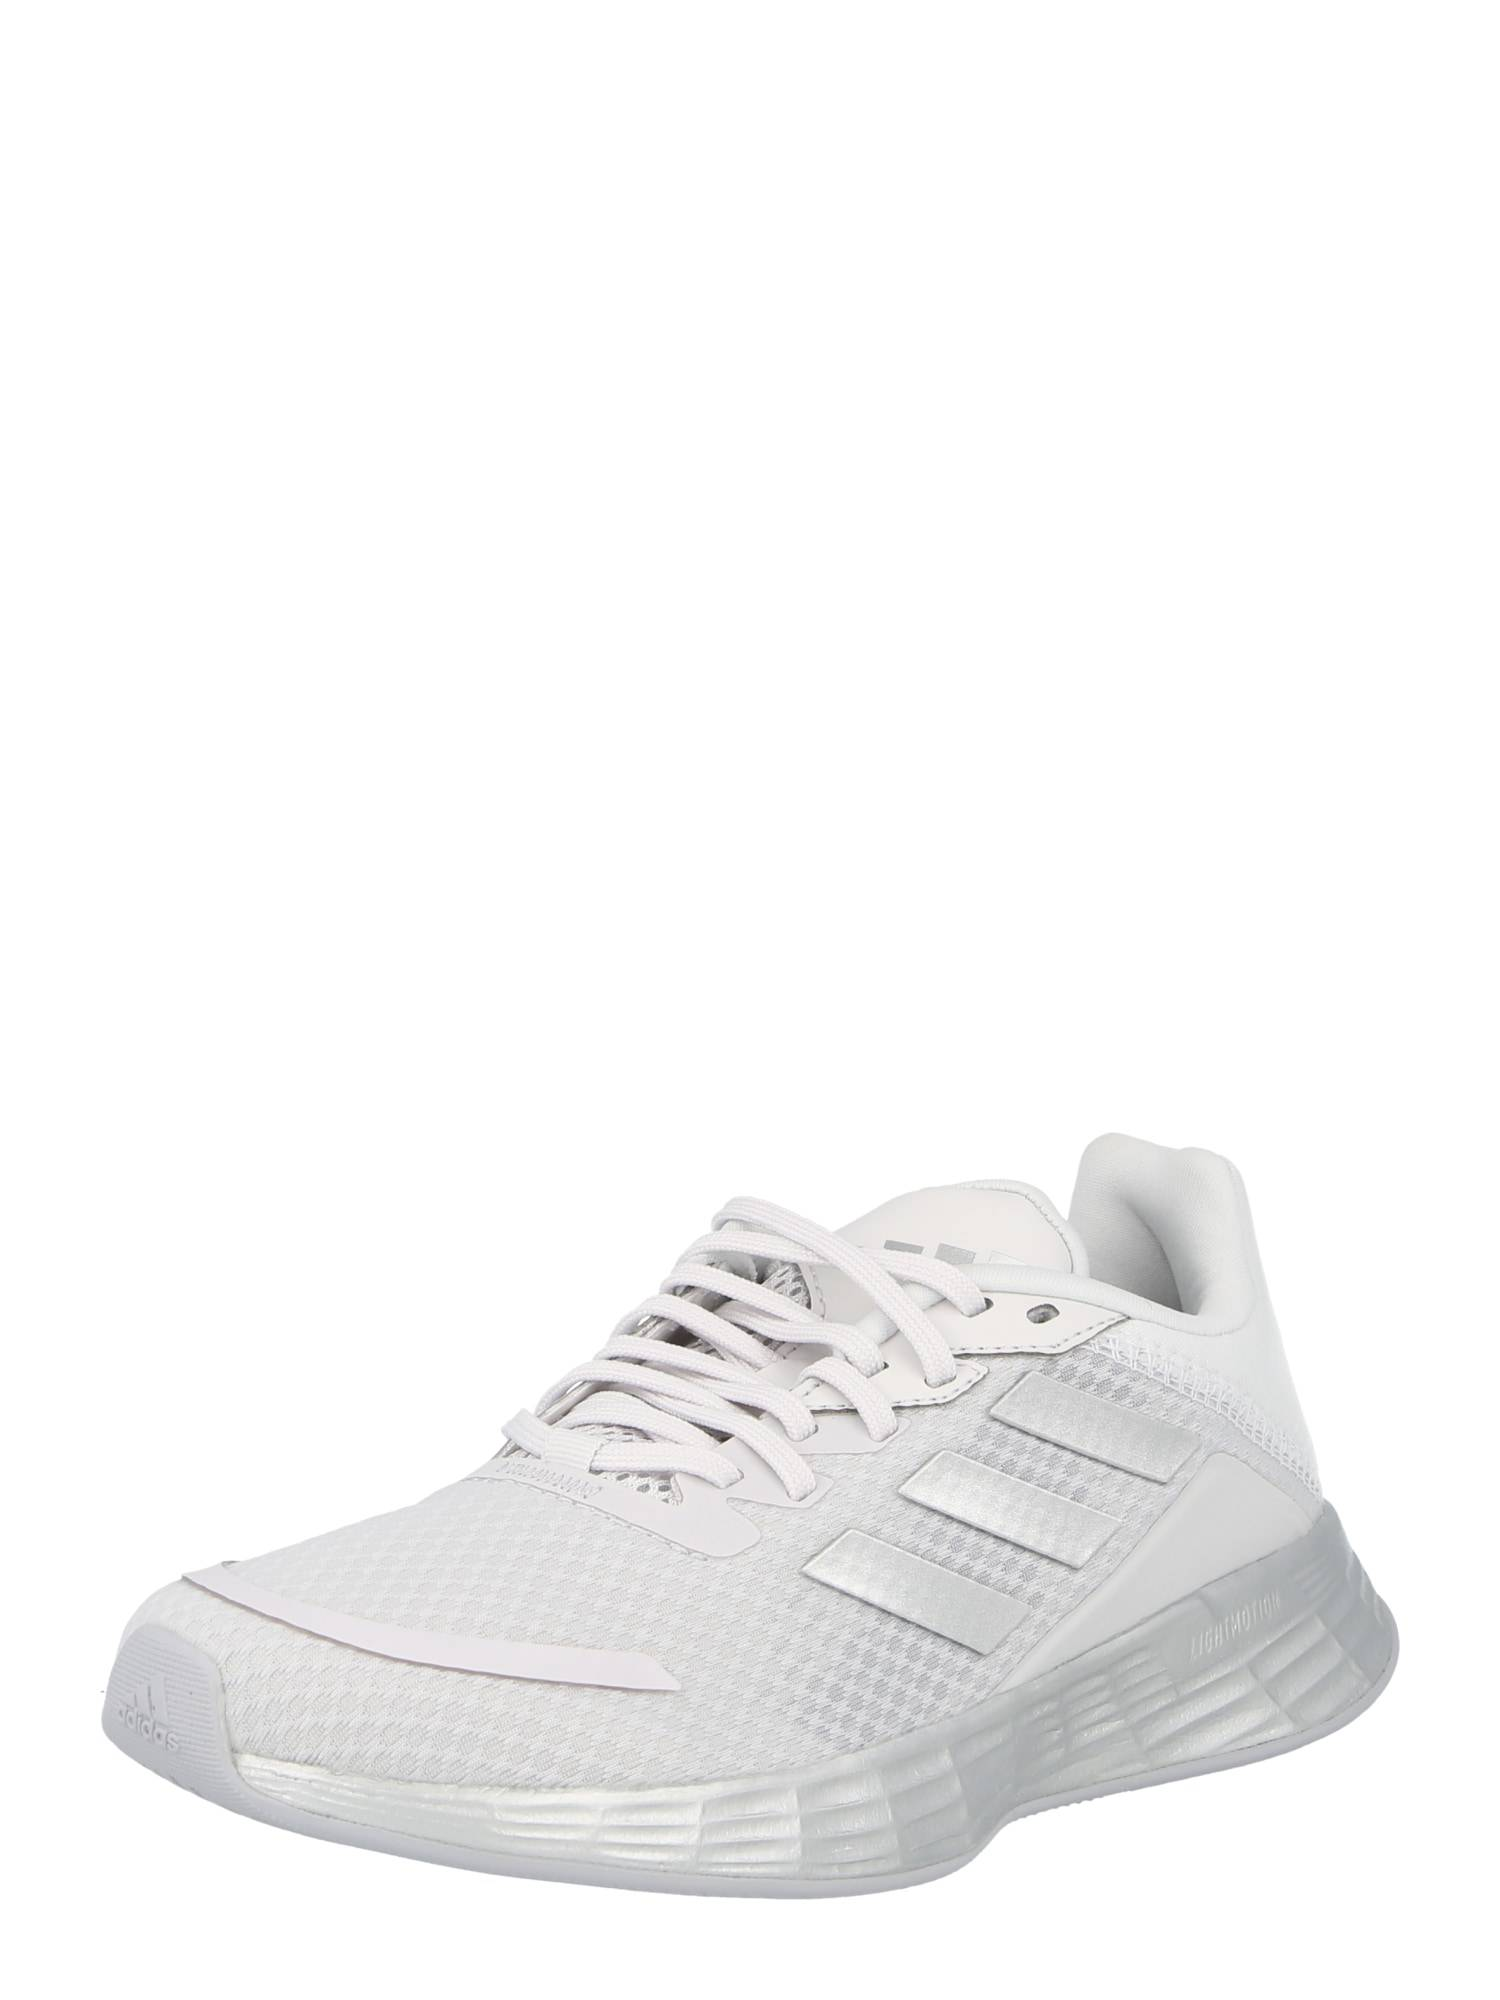 ADIDAS PERFORMANCE Chaussure de course 'Duramo'  - Blanc - Taille: 4 - male